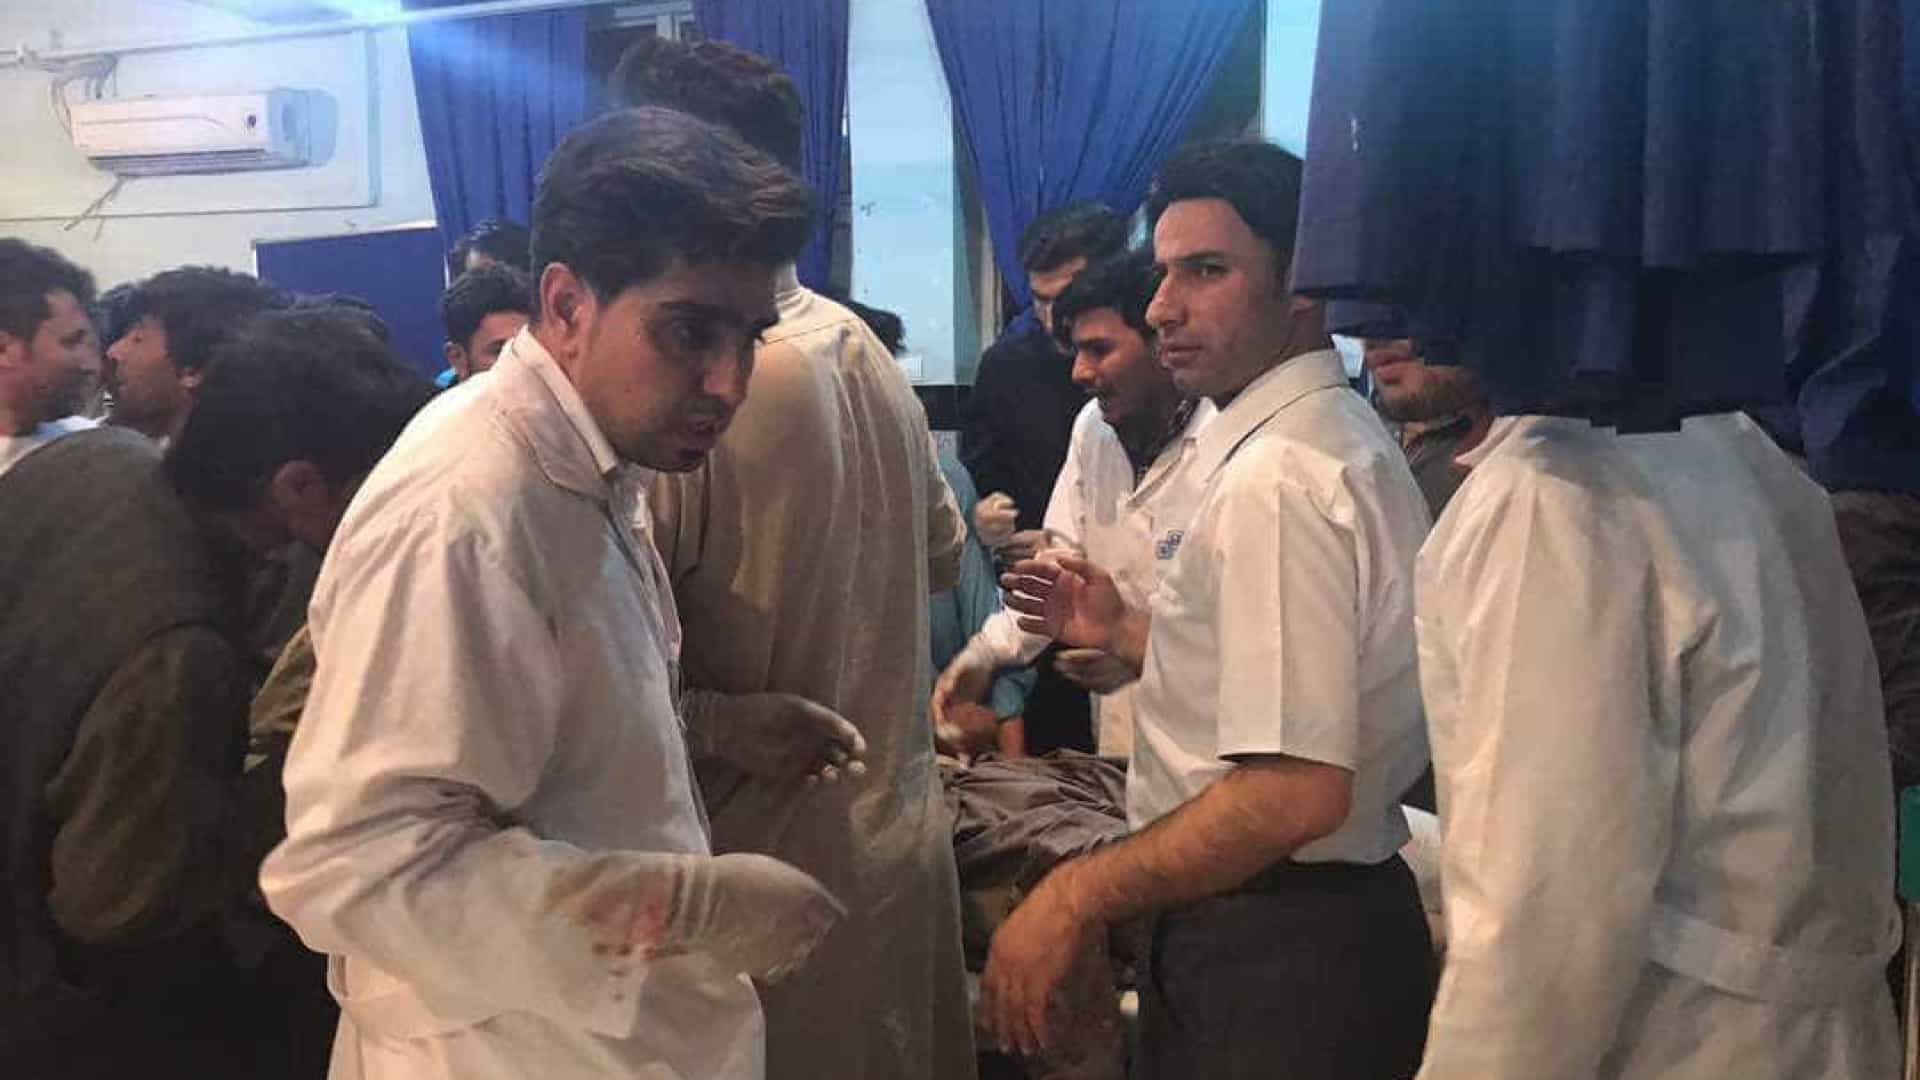 Atentado anti-xiita fez 29 mortos e 63 feridos